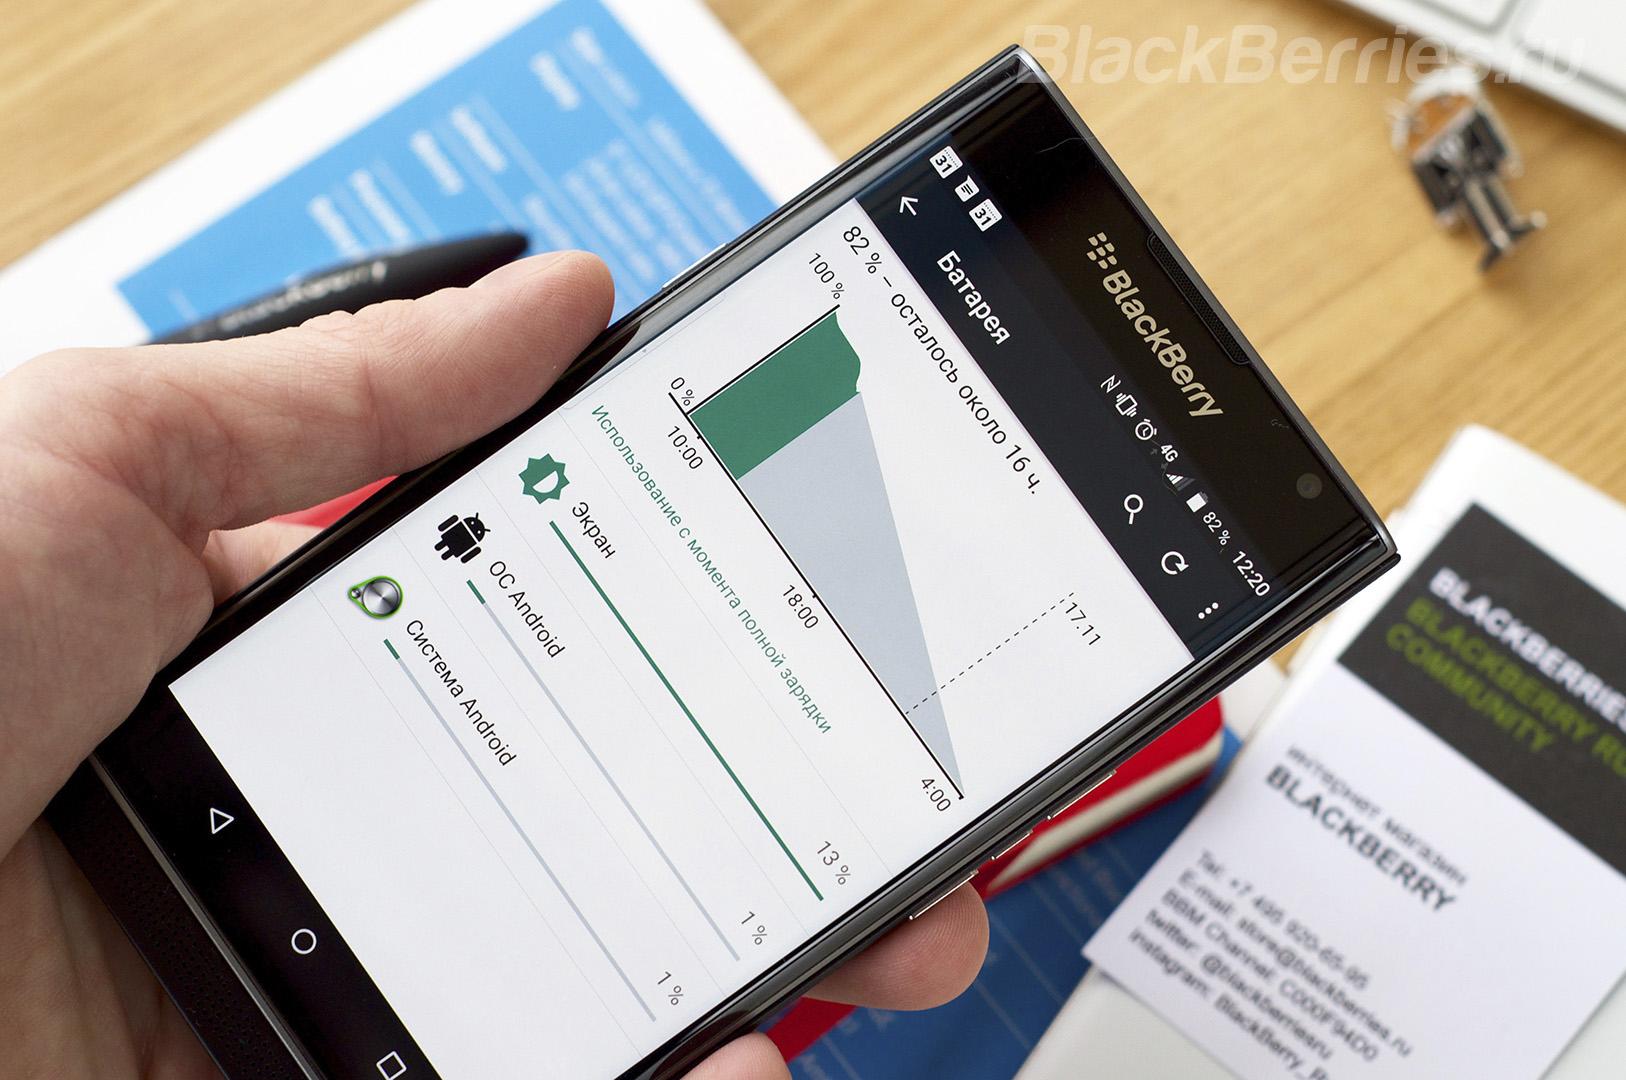 BlackBerry-Priv-Review-006